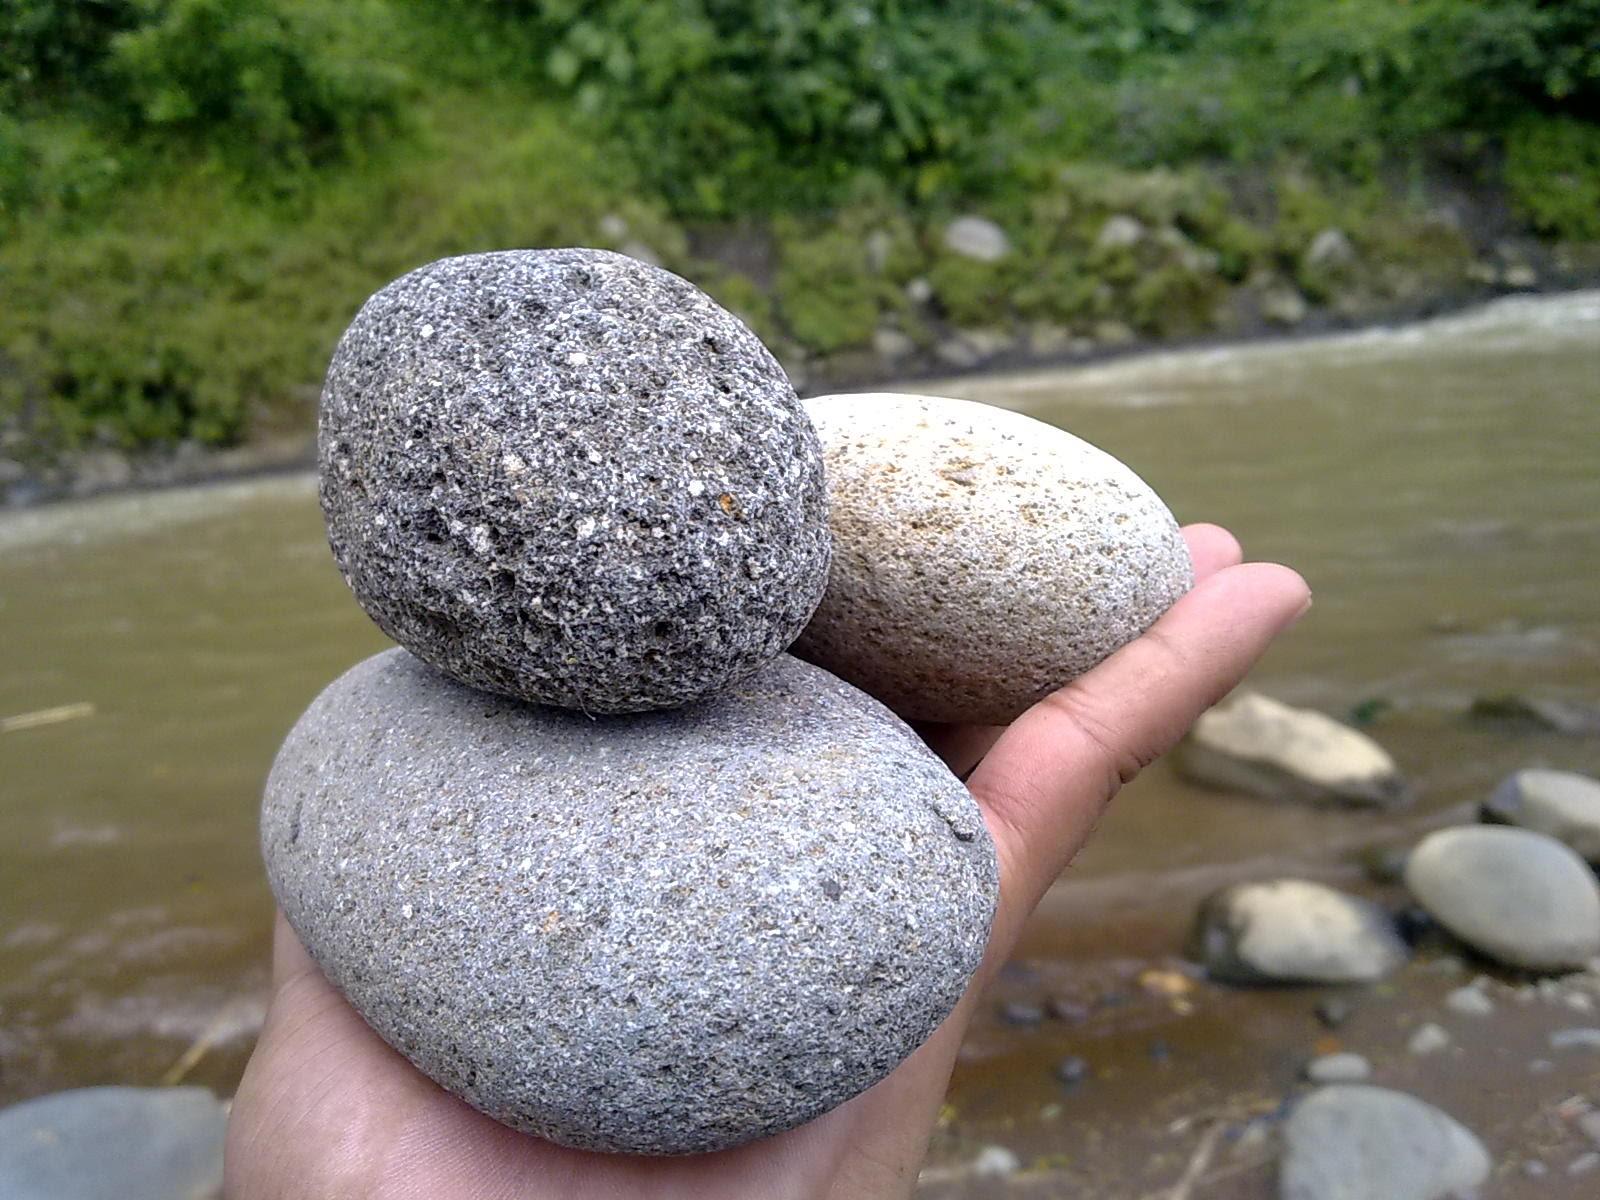 Koleksi Mewarnai Gambar Batu